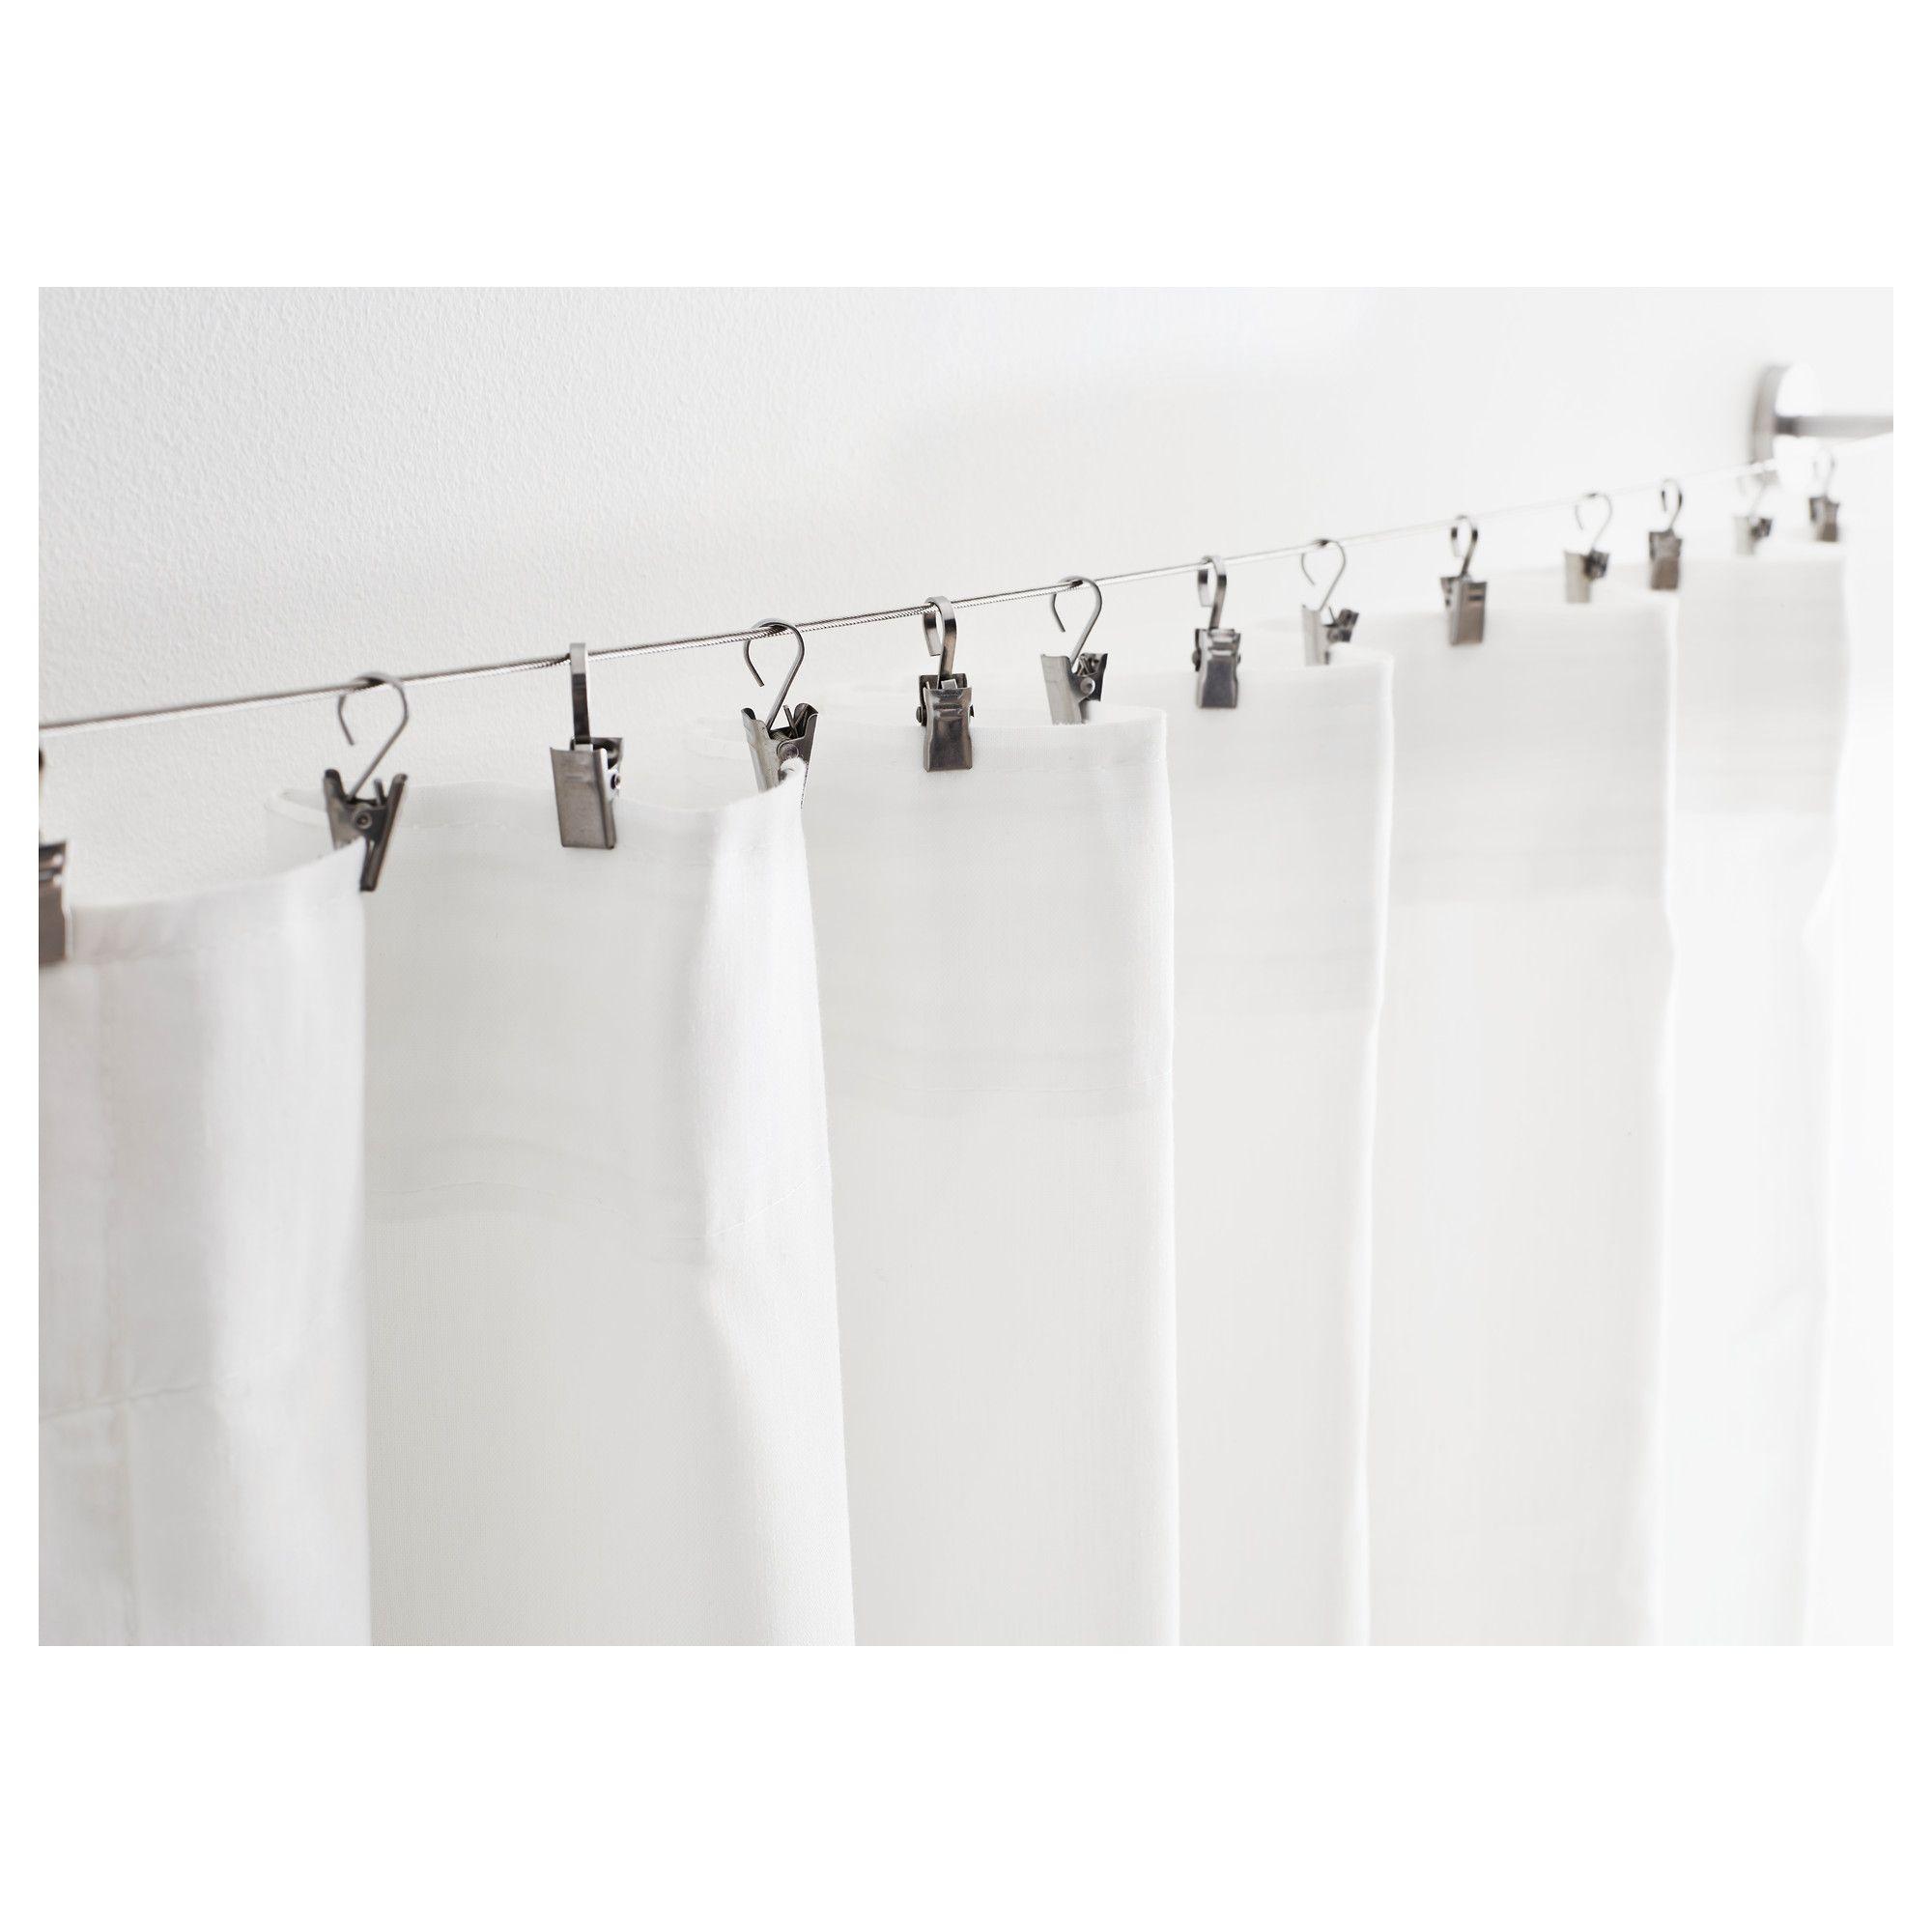 11 curtain wire ideas diy curtains